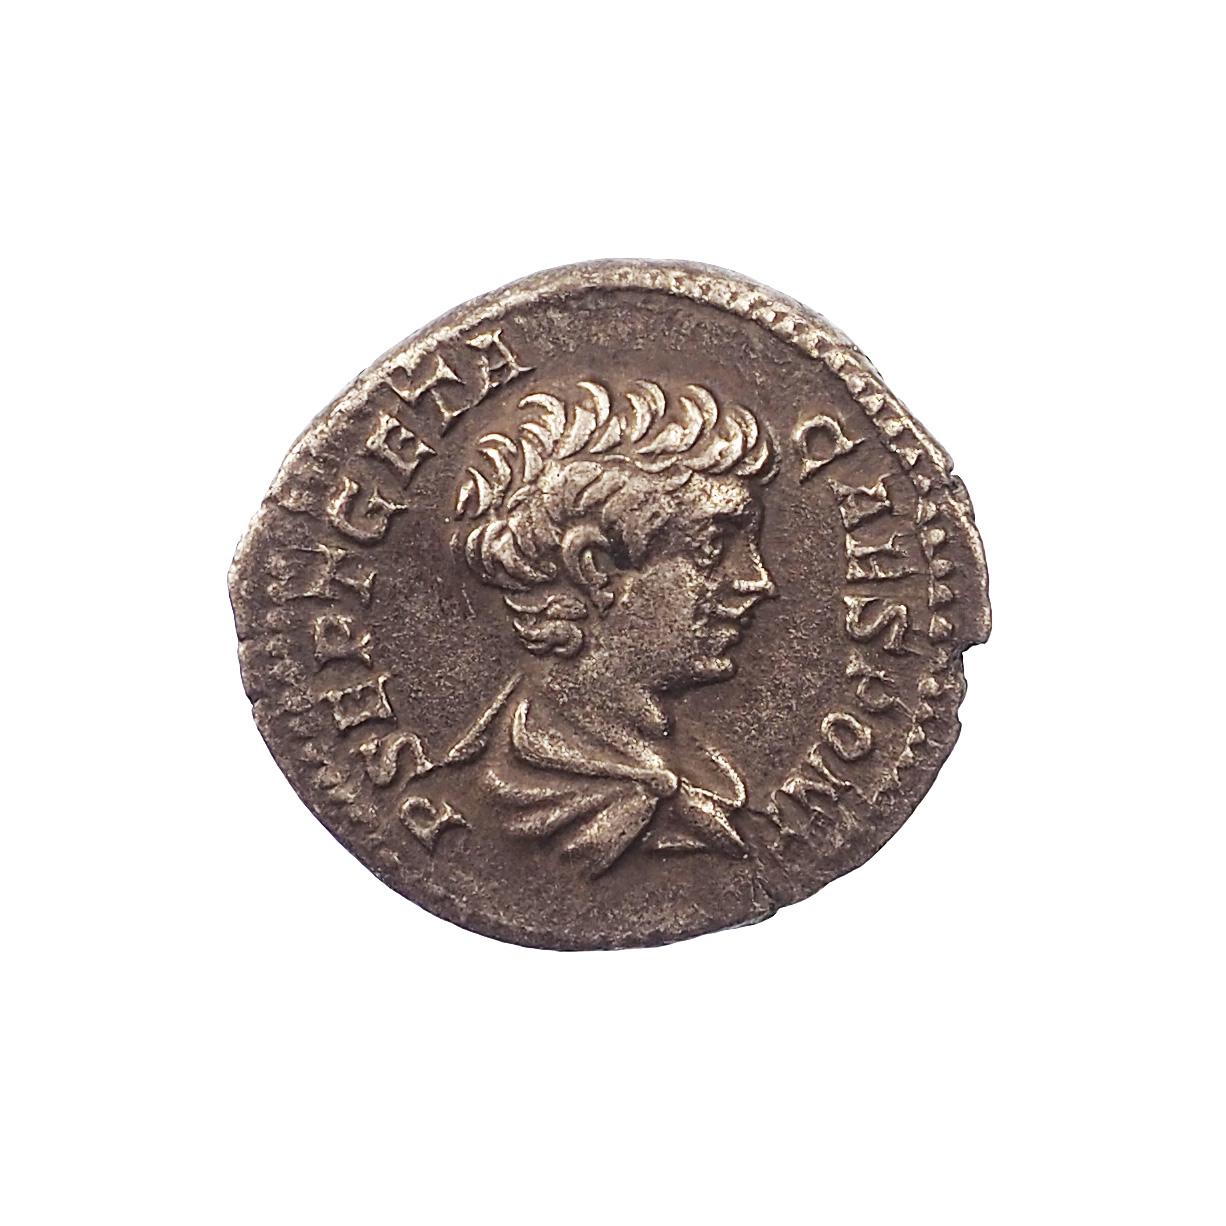 Geta (211), Denier, NOBILITAS, Rome, Argent, TTB+, RIC 13a